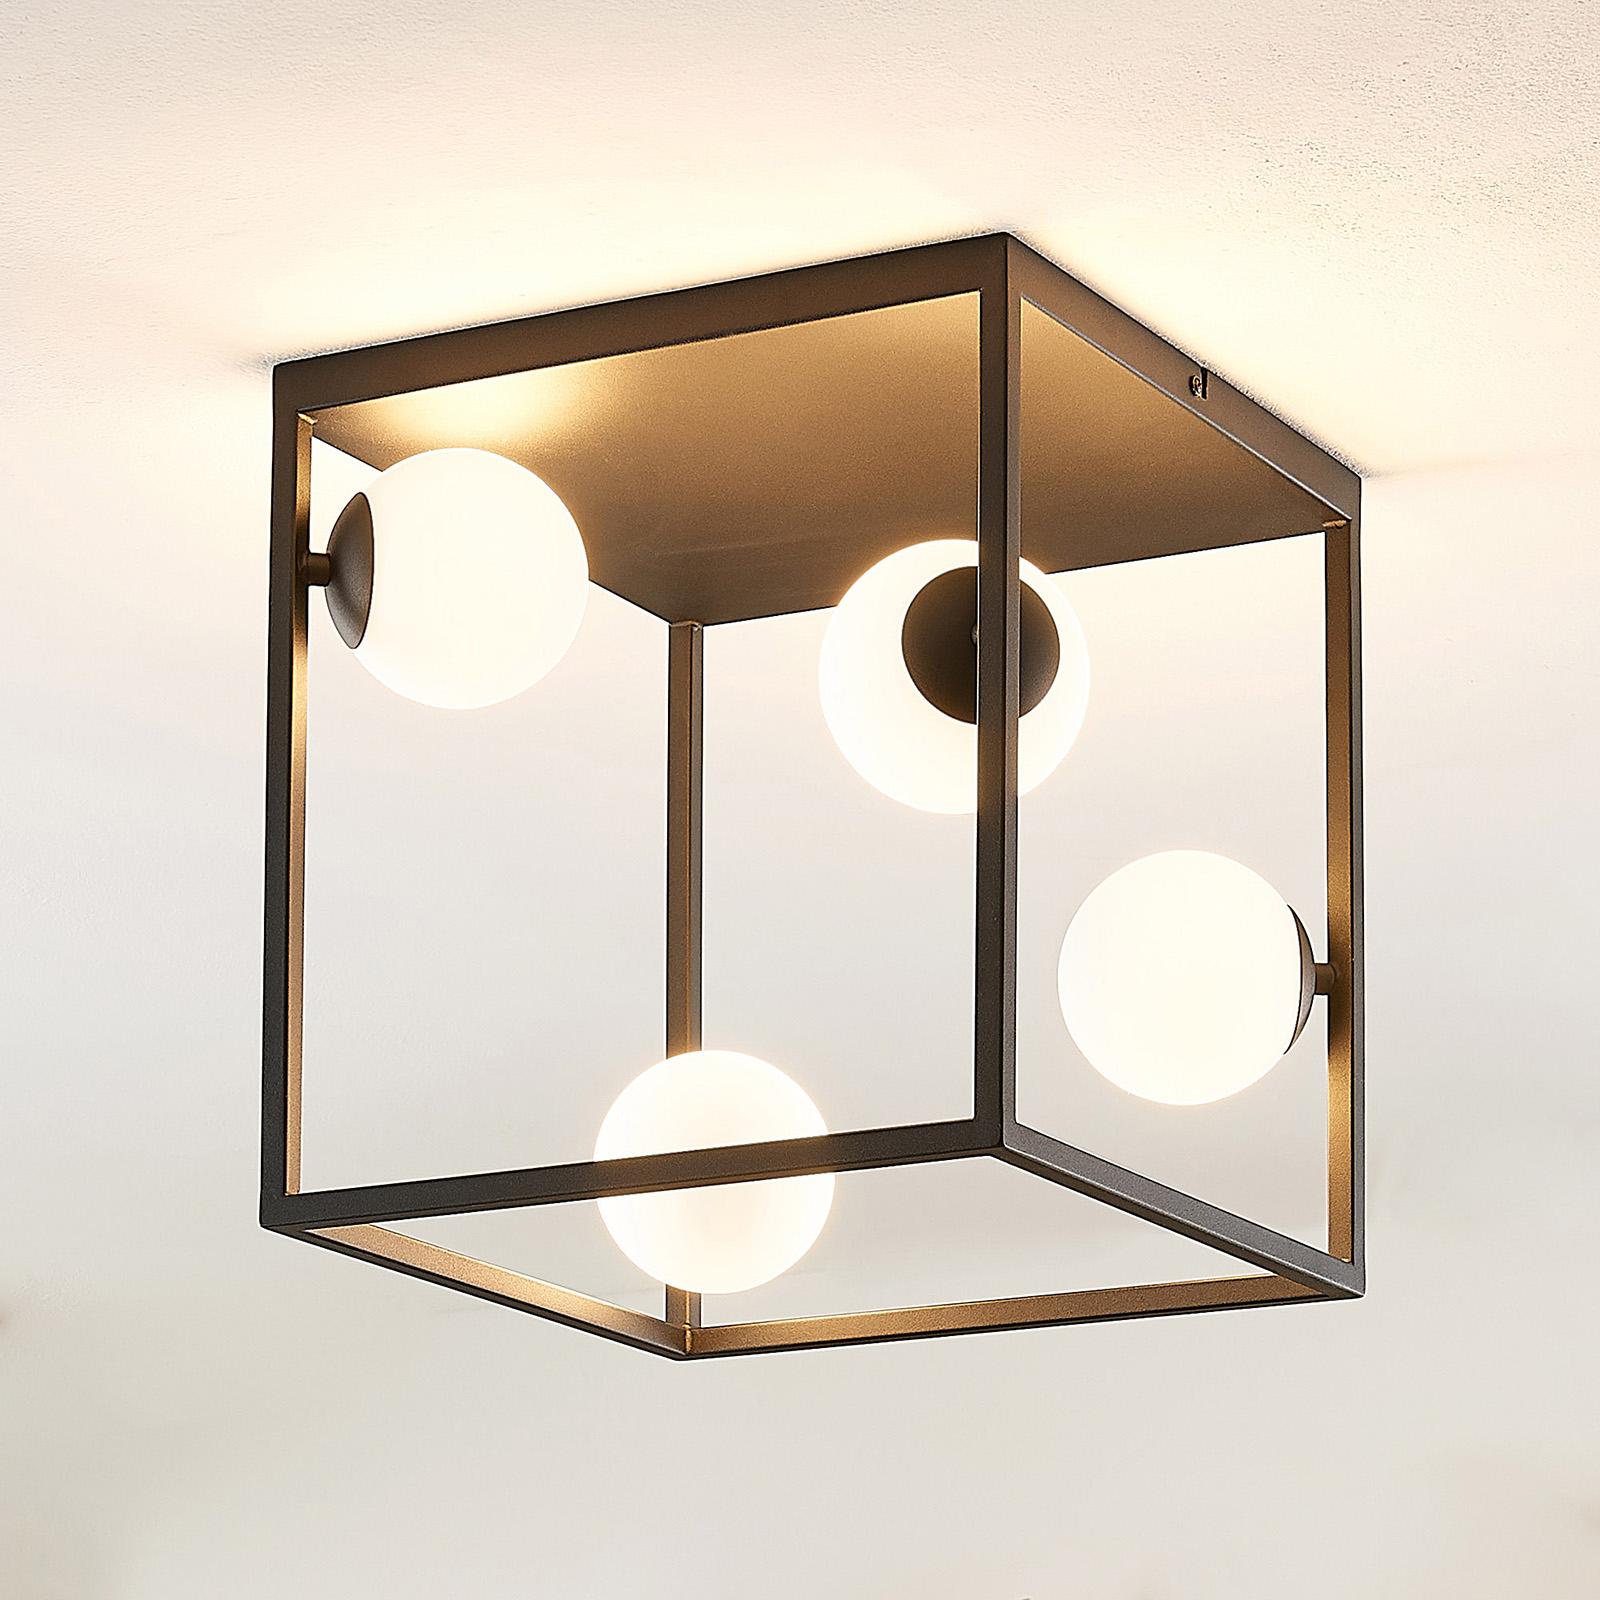 Lindby Utopia LED-Deckenleuchte, vierflammig